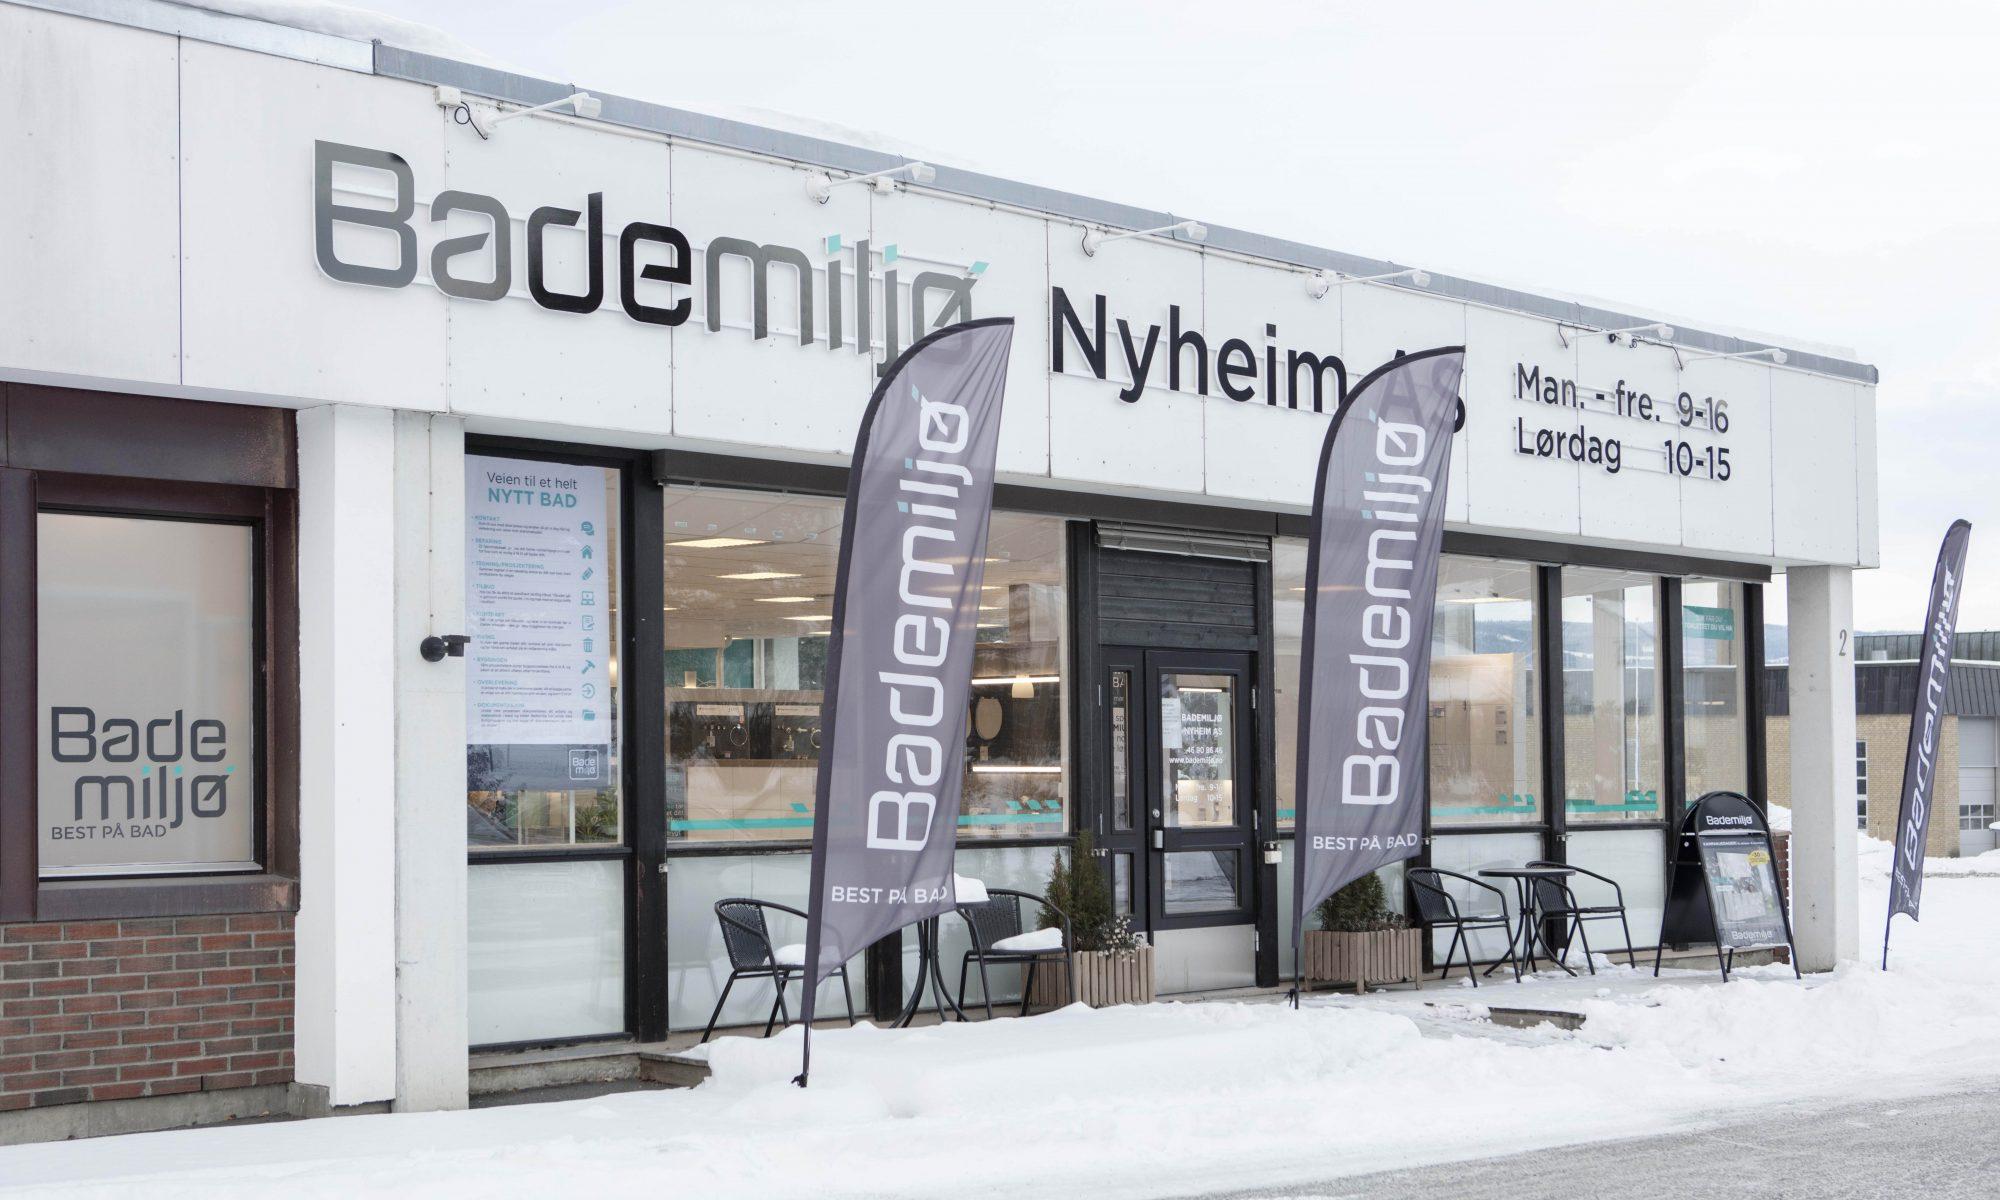 Bademiljø Nyheim AS